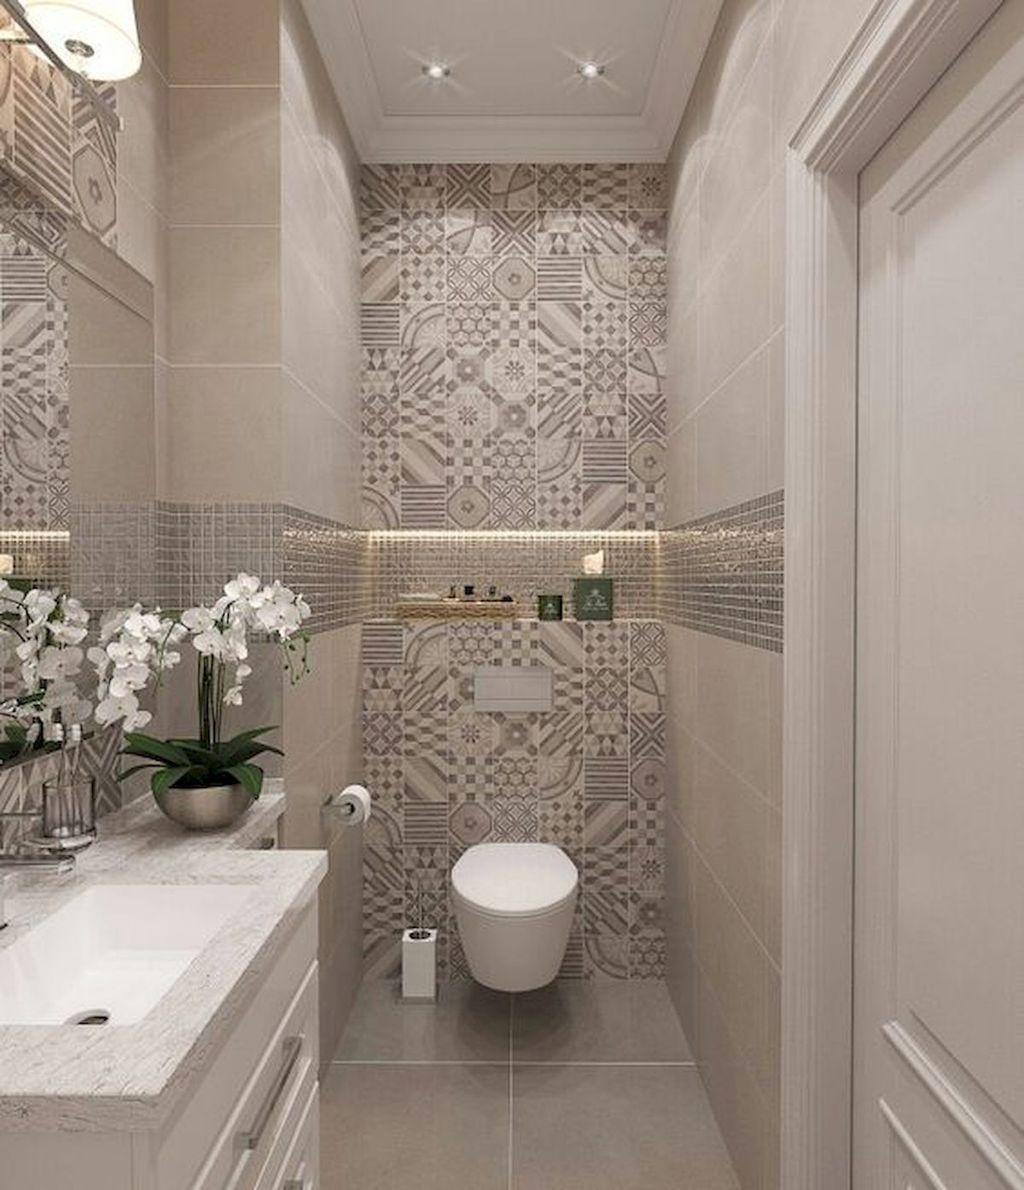 30+ Splendid Small Bathroom Remodel Ideas For You - TRENDECORS on Small Bathroom Renovation Ideas  id=23613